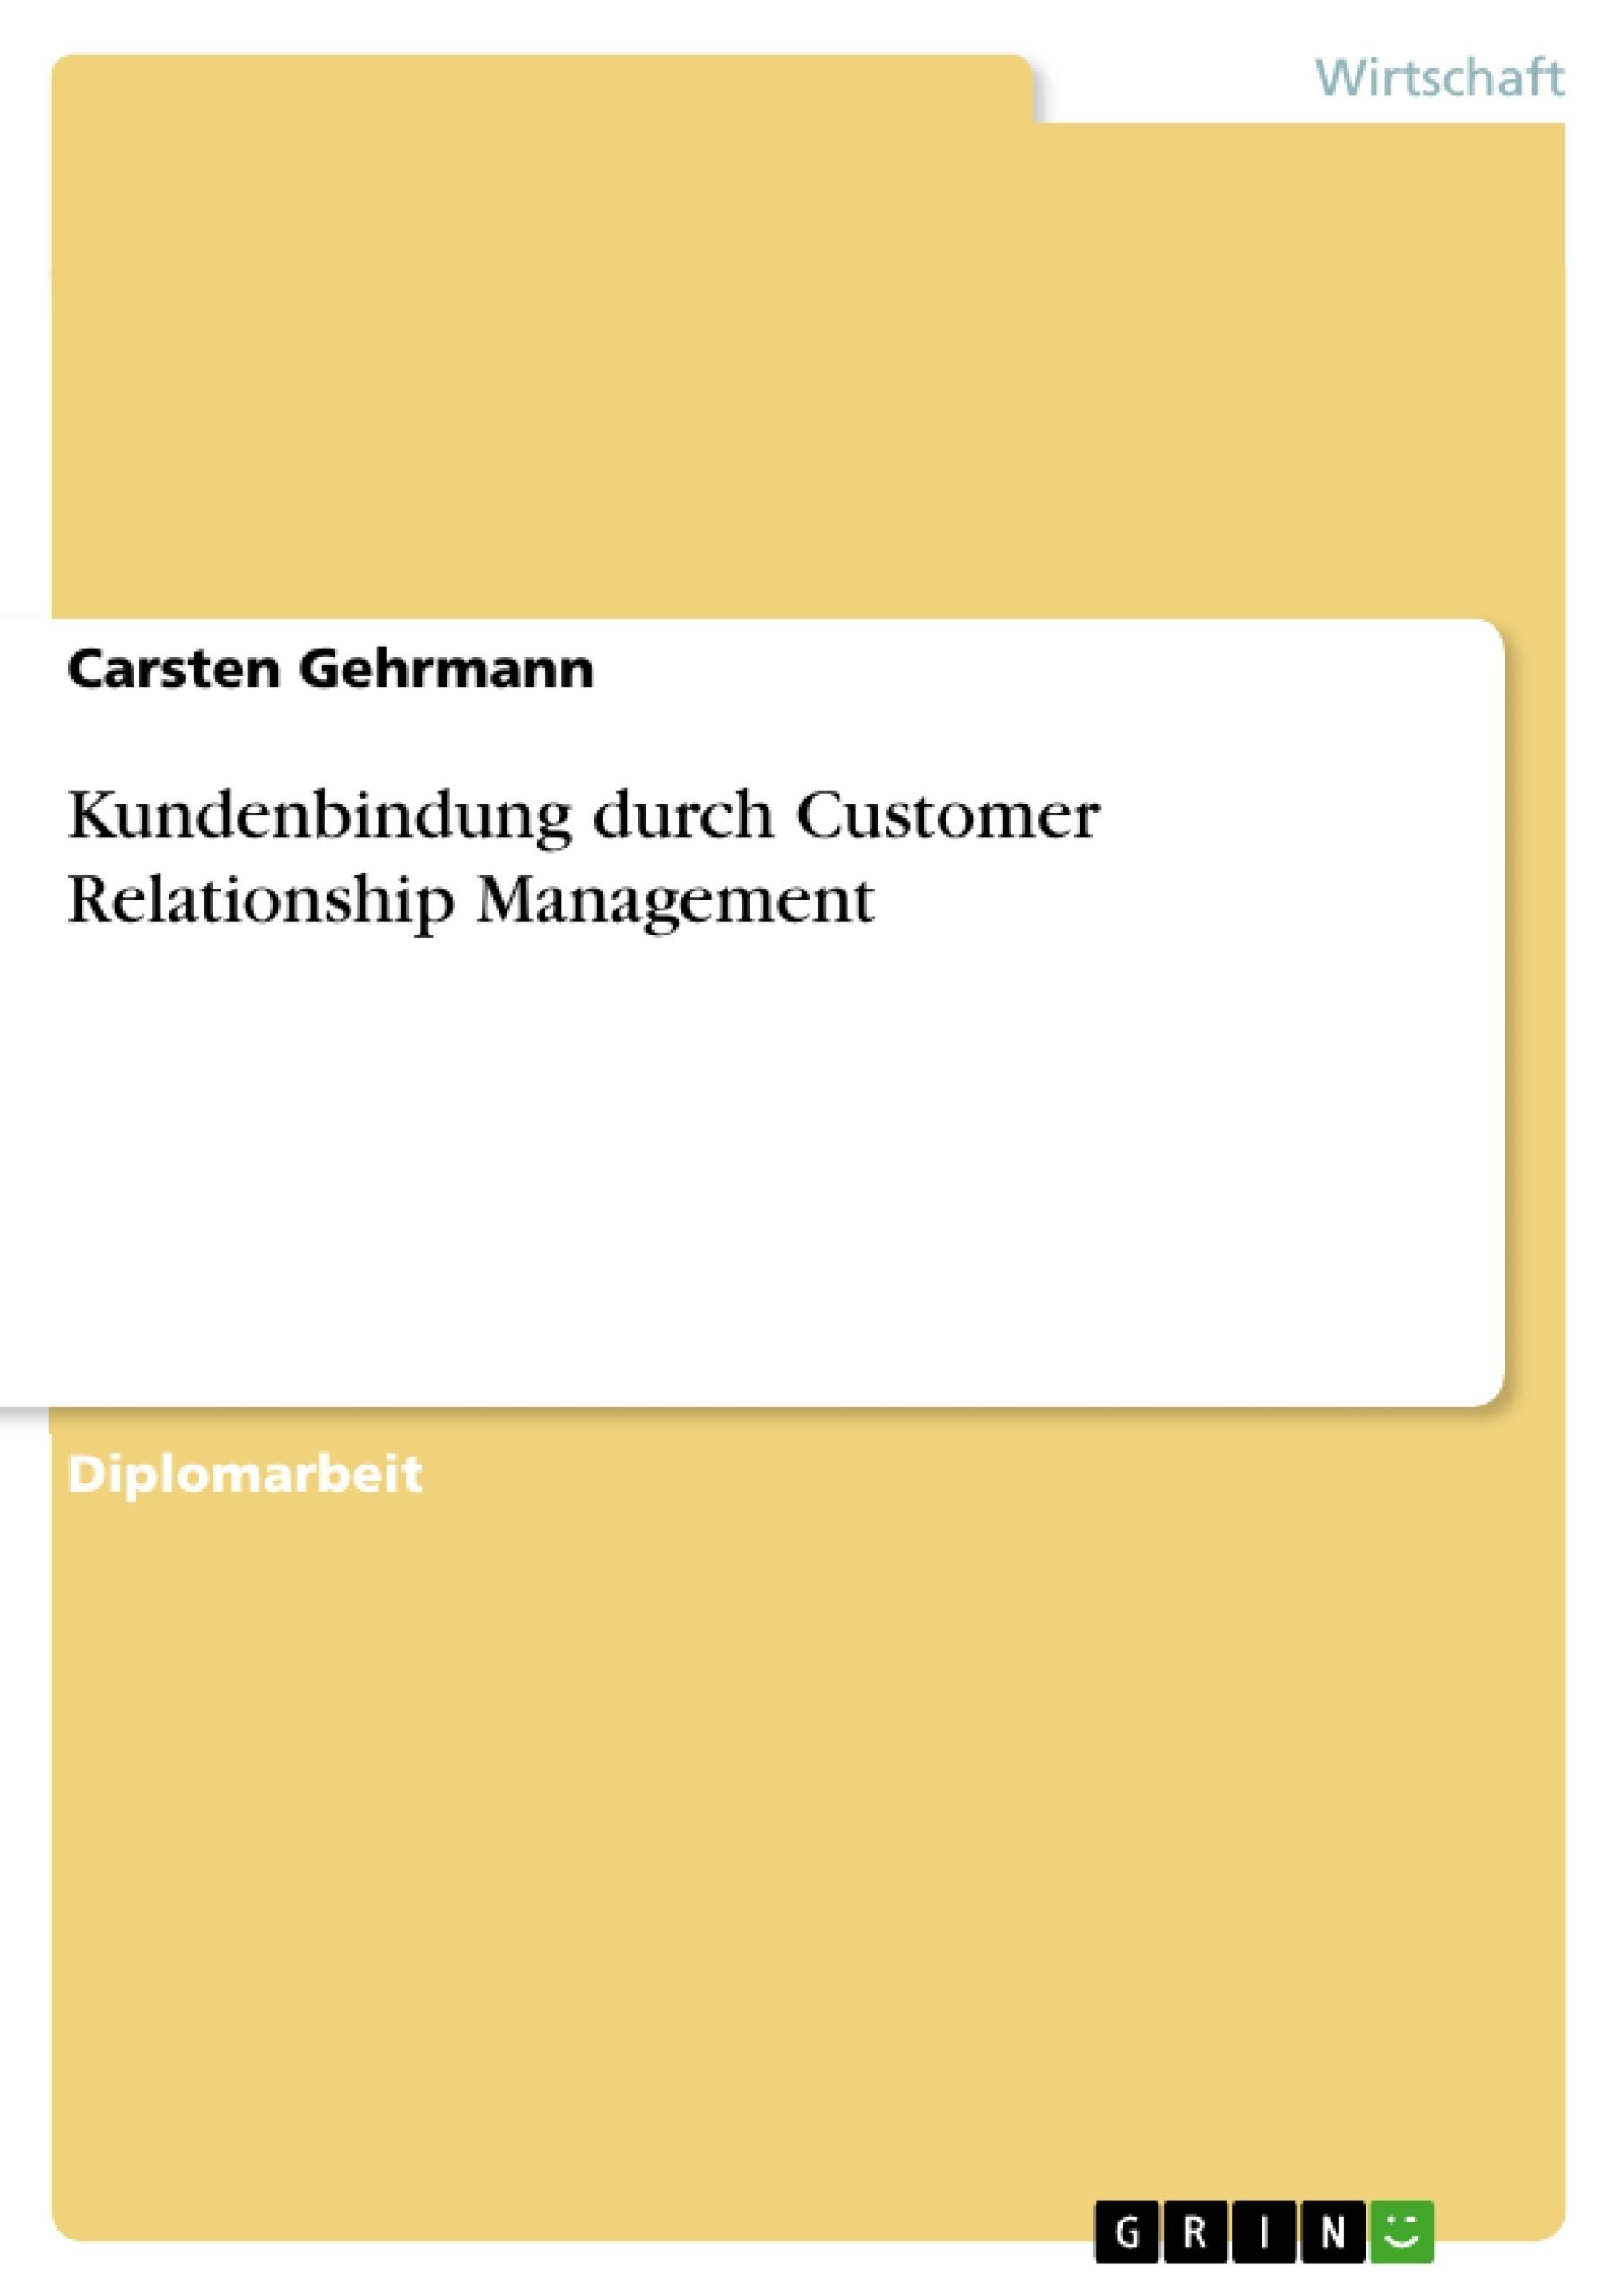 Titel: Kundenbindung durch Customer Relationship Management